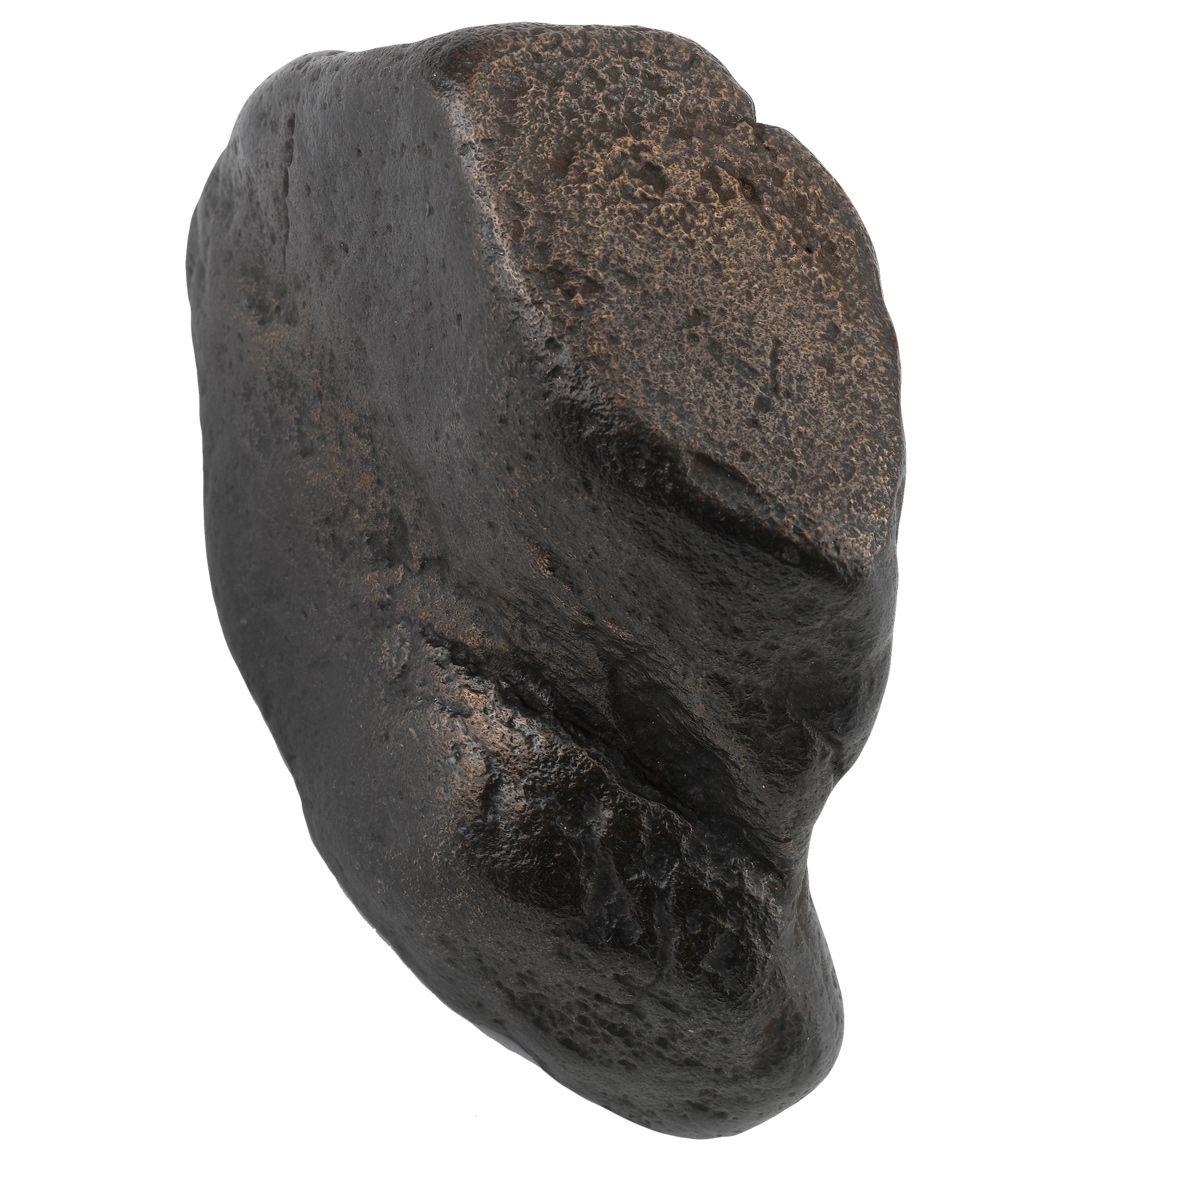 Faye Toogood / Stone Door Knob, Cast Bronze | Sticks & Stones ...